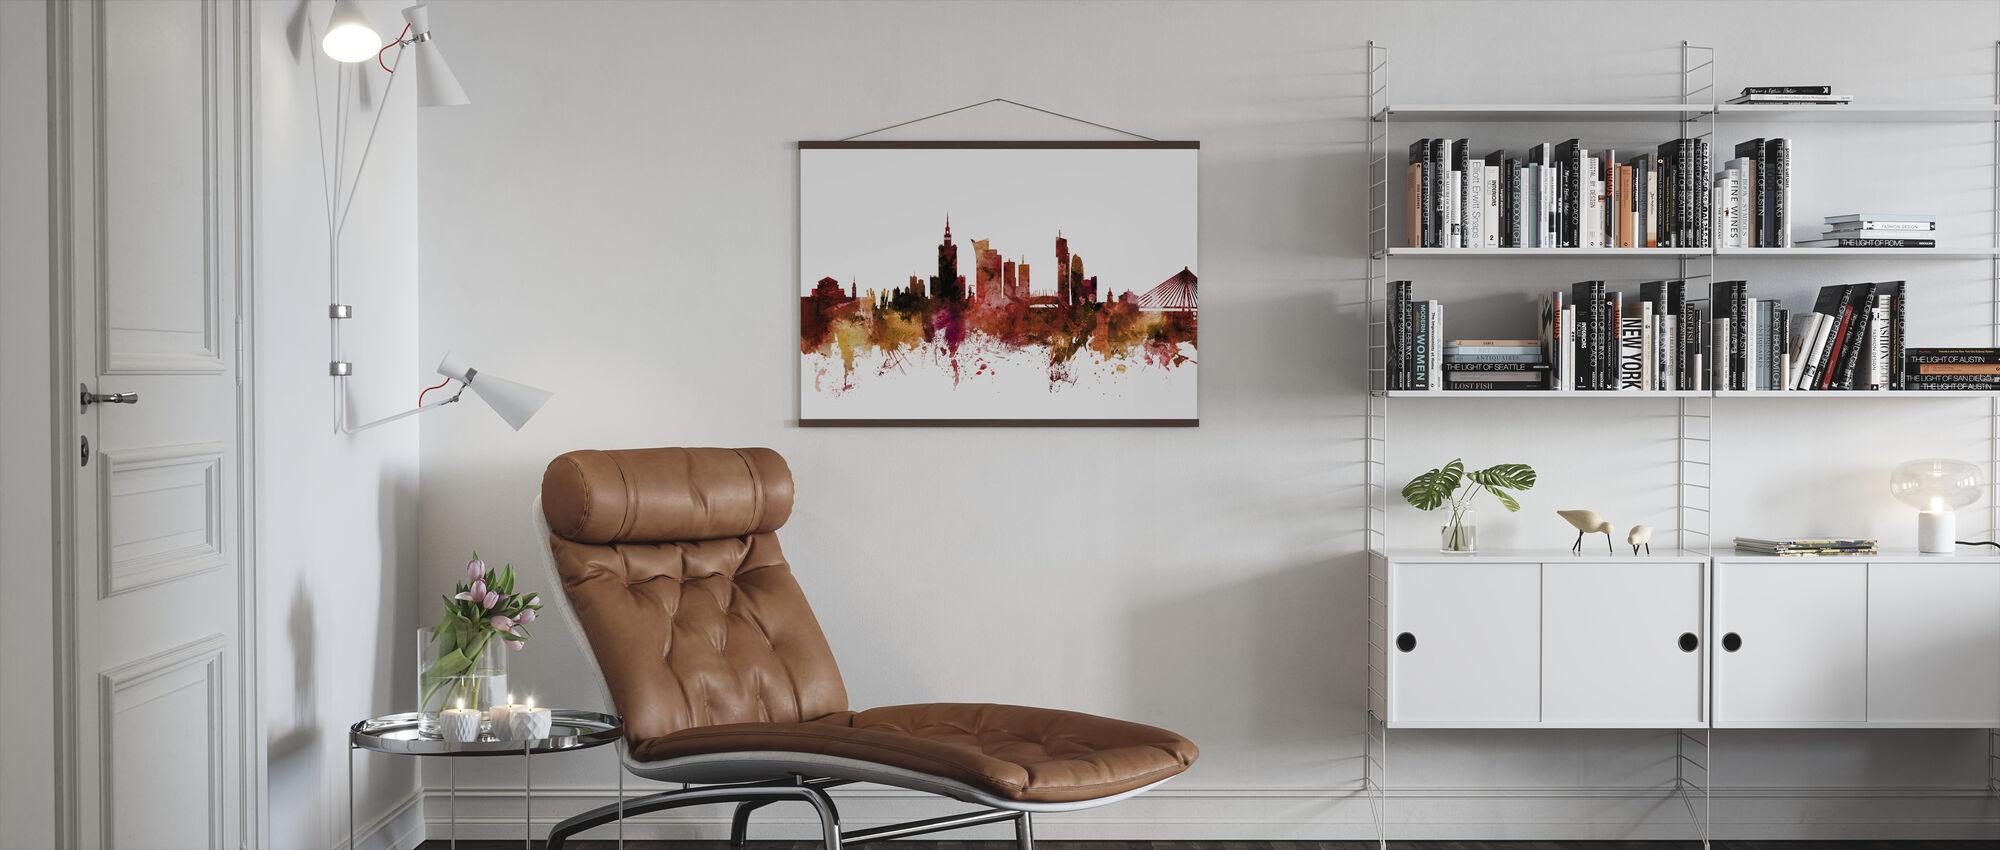 Warsaw Poland Skyline - Poster - Living Room